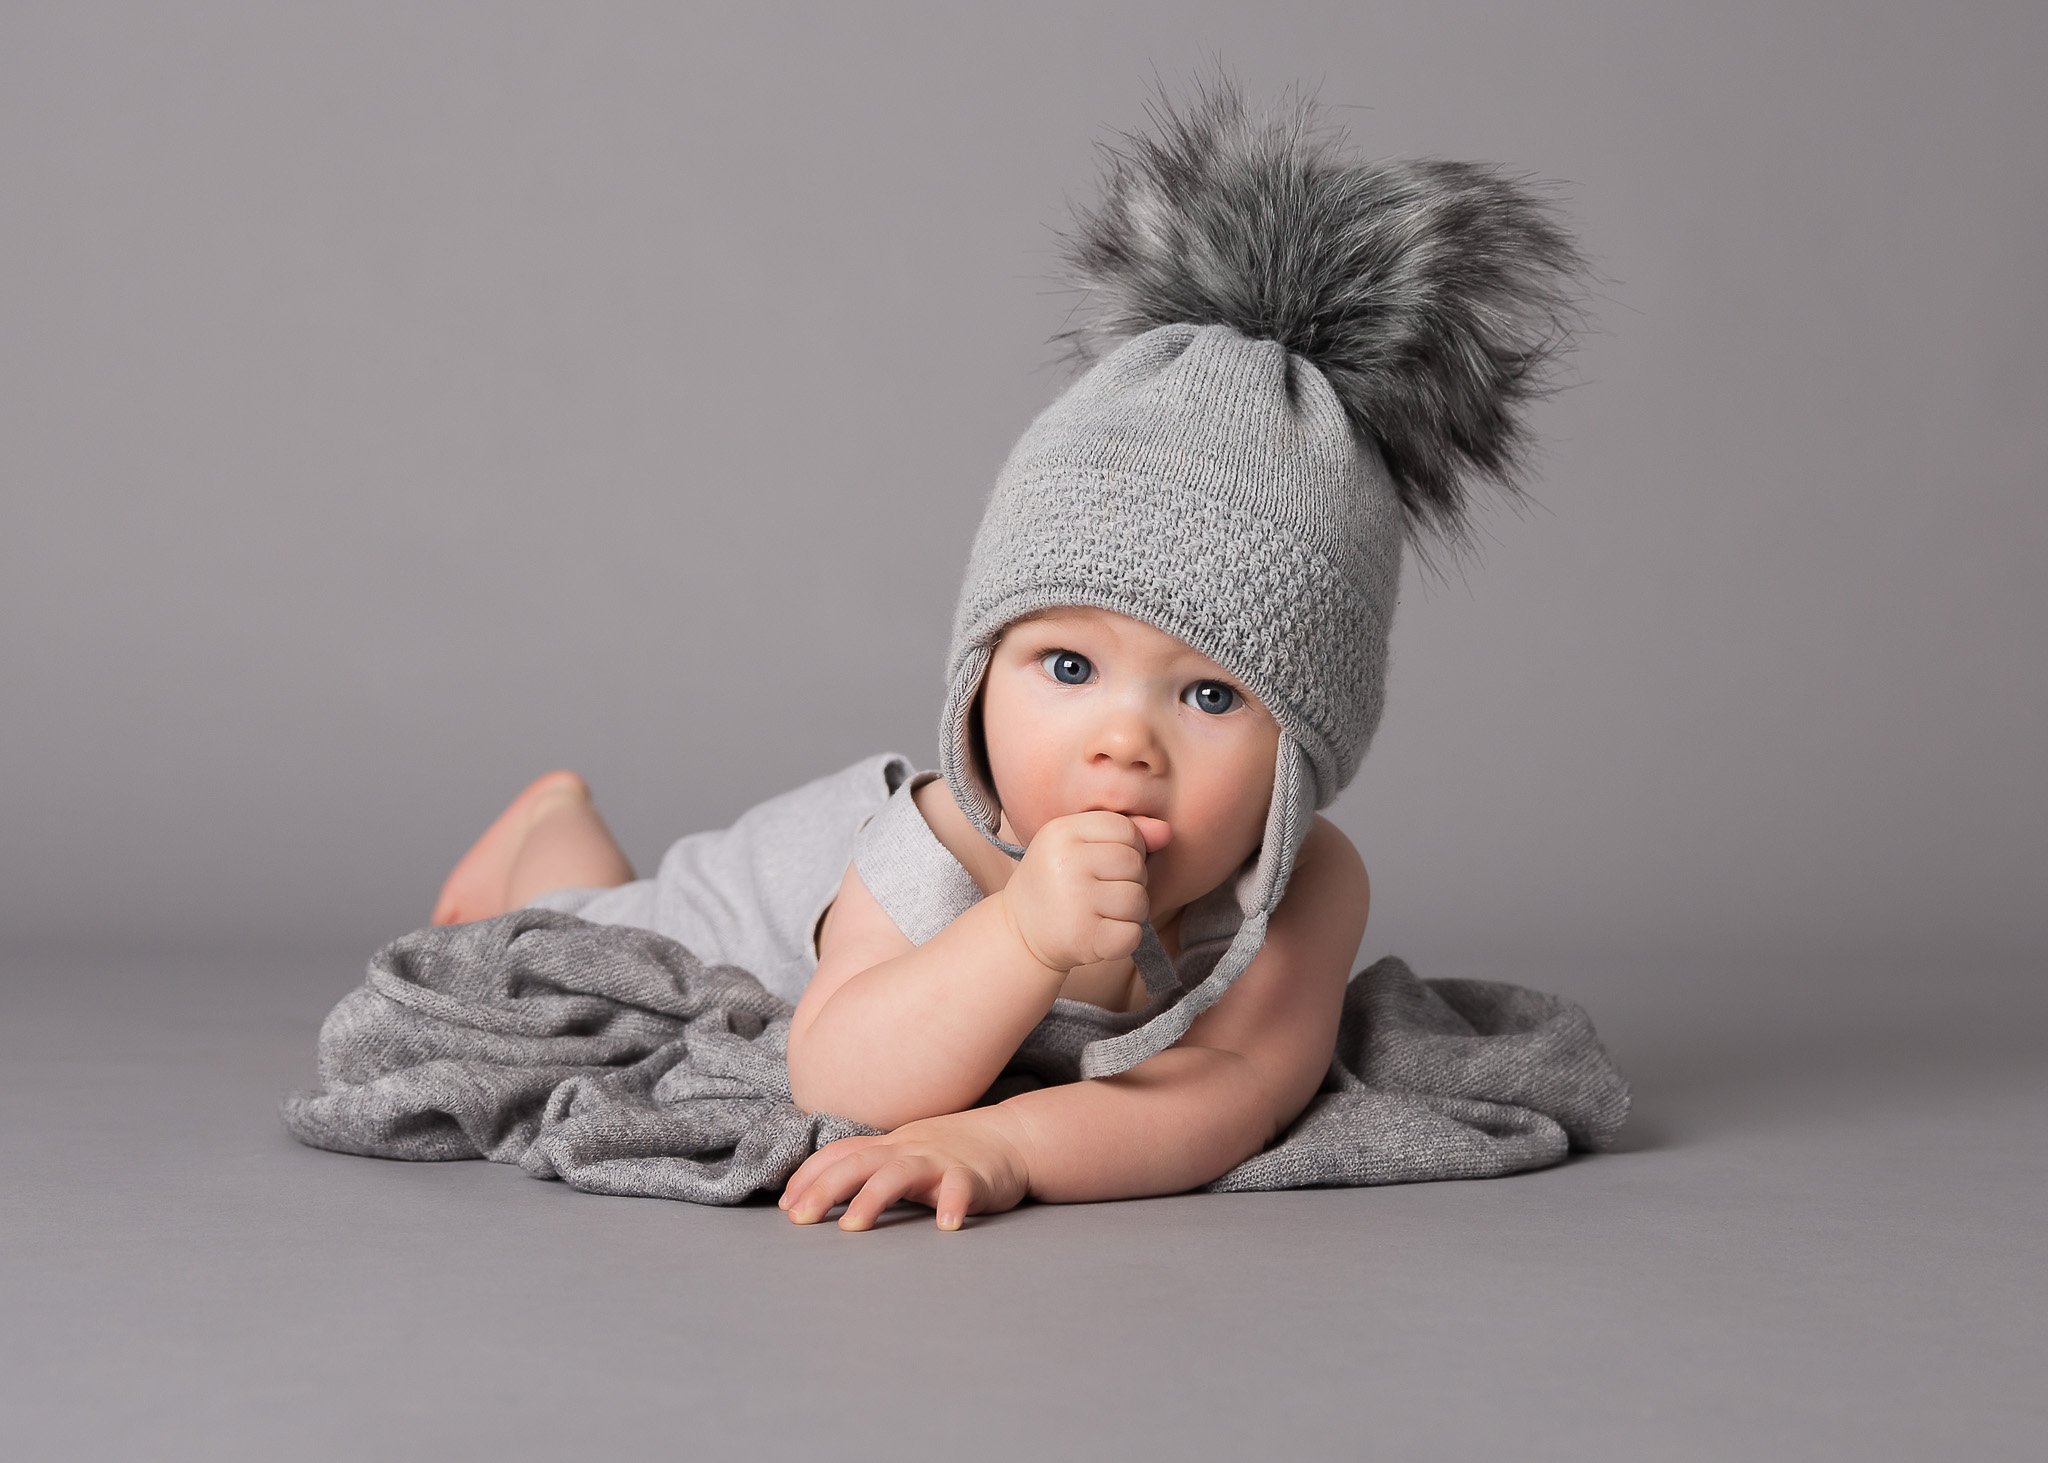 aberdeen baby photographer banchory photographer